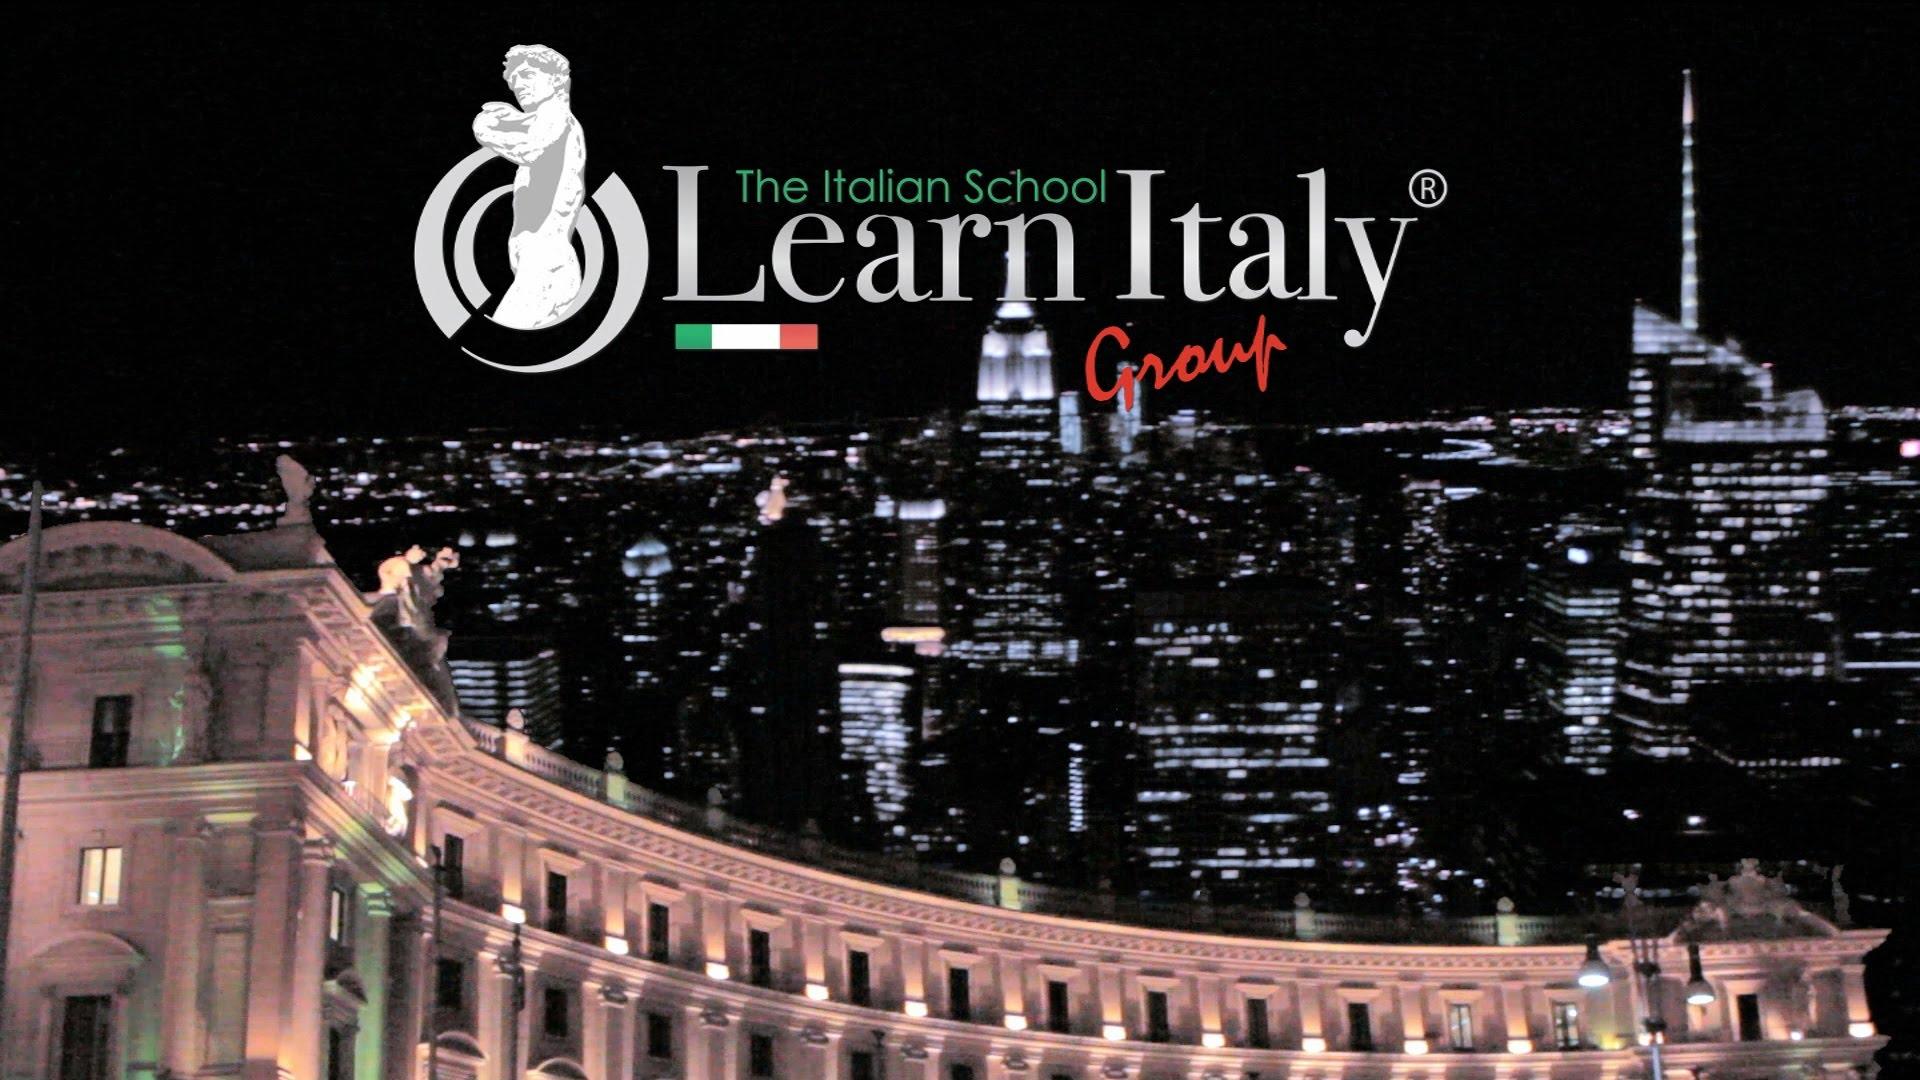 Massimo veccia Learn Italy a New York